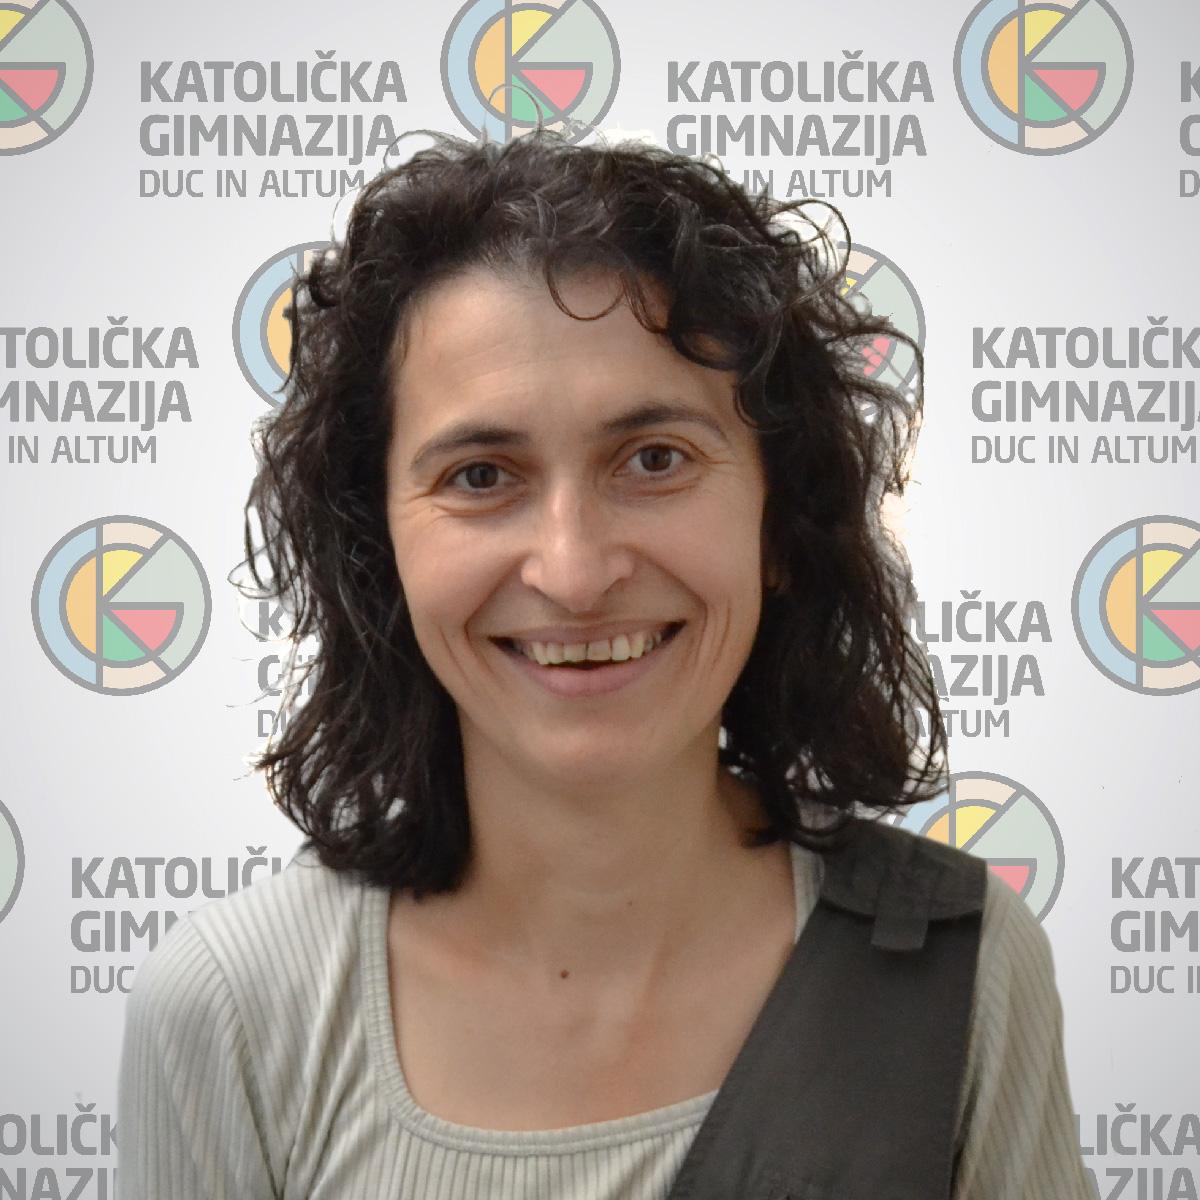 Katarina Soldo Obućina